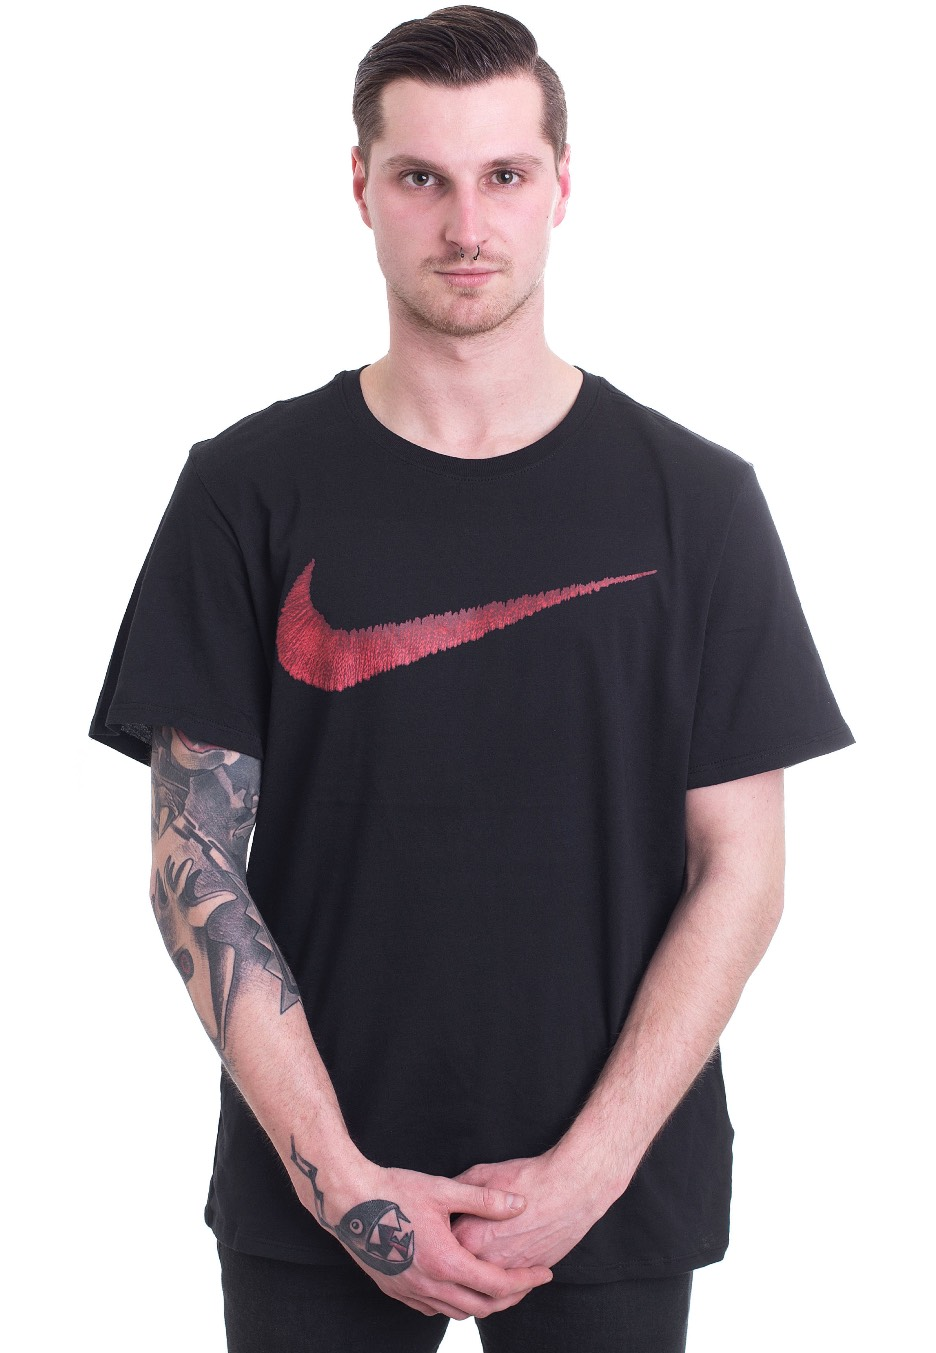 1c42f892b427 Nike - Swoosh Black Sport Red - T-Shirt - Streetwear Shop - Impericon.com  Worldwide